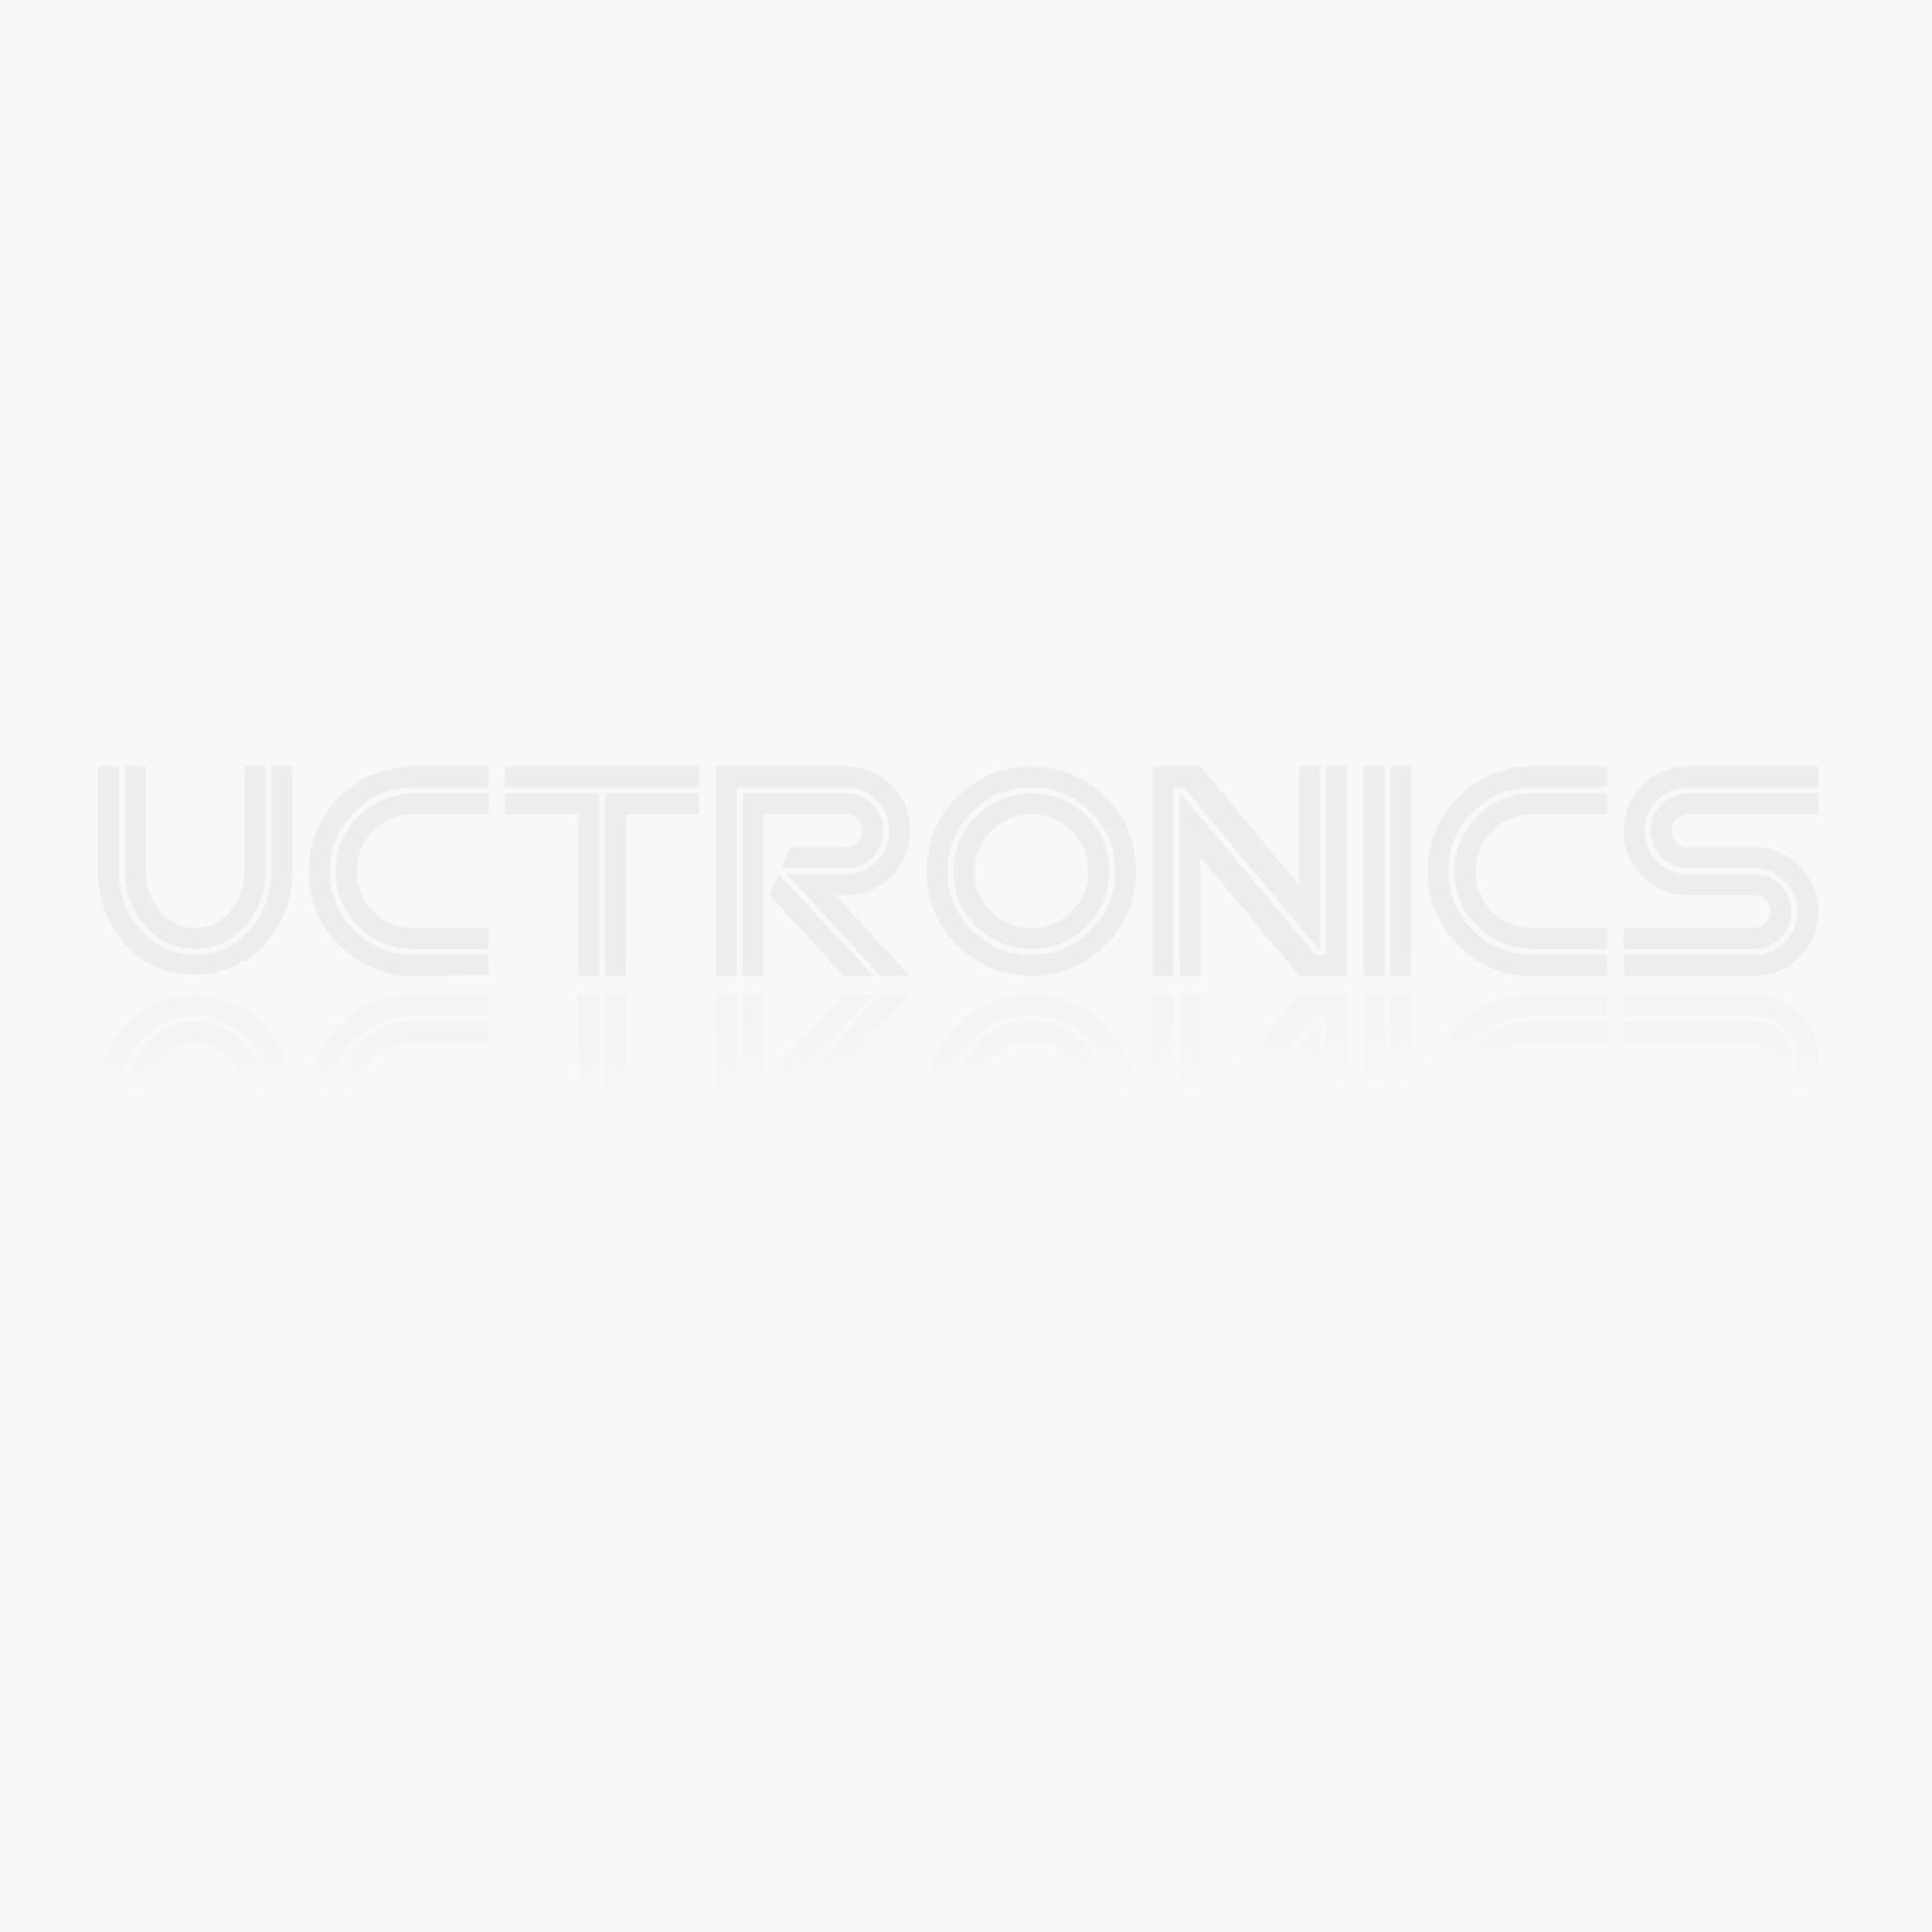 PAM8403 Digital Amplifier Board Audio Class D 2*3W USB Powered for Arduino